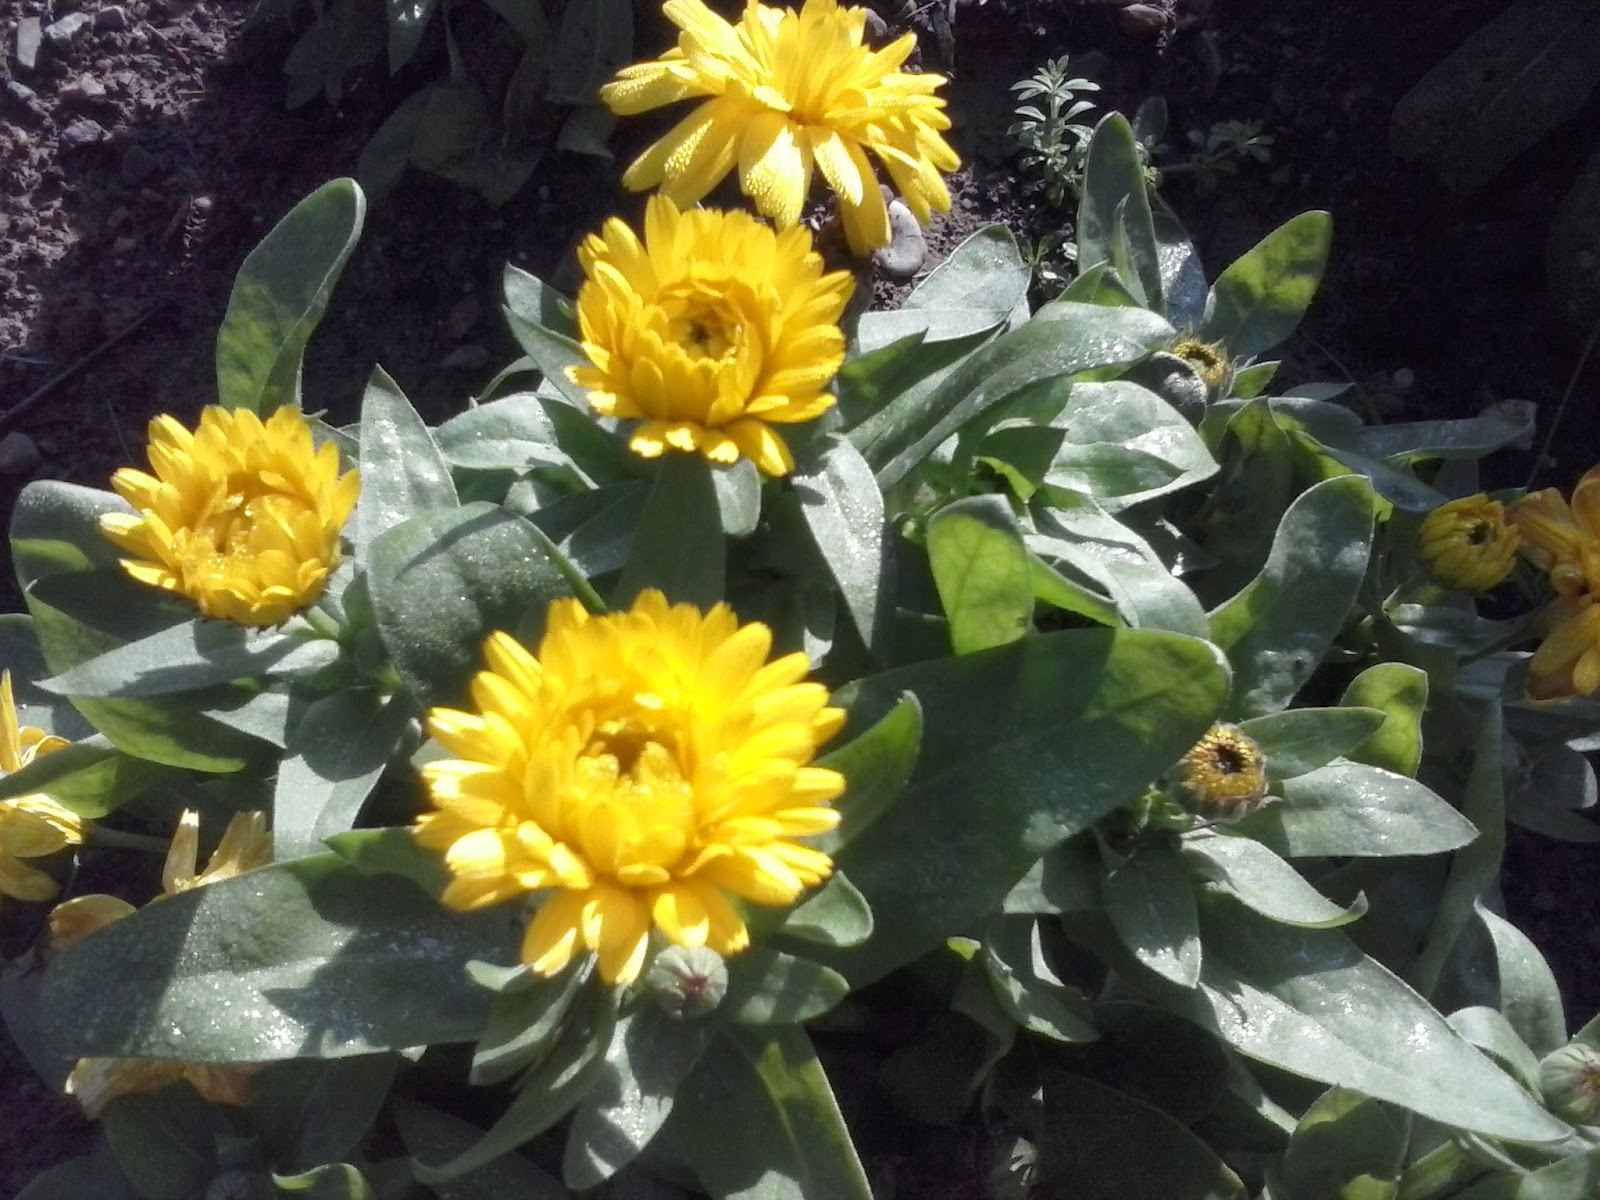 Imagenes Flores De Primavera - Naturaleza, Paisajes Imágenes gratis en Pixabay